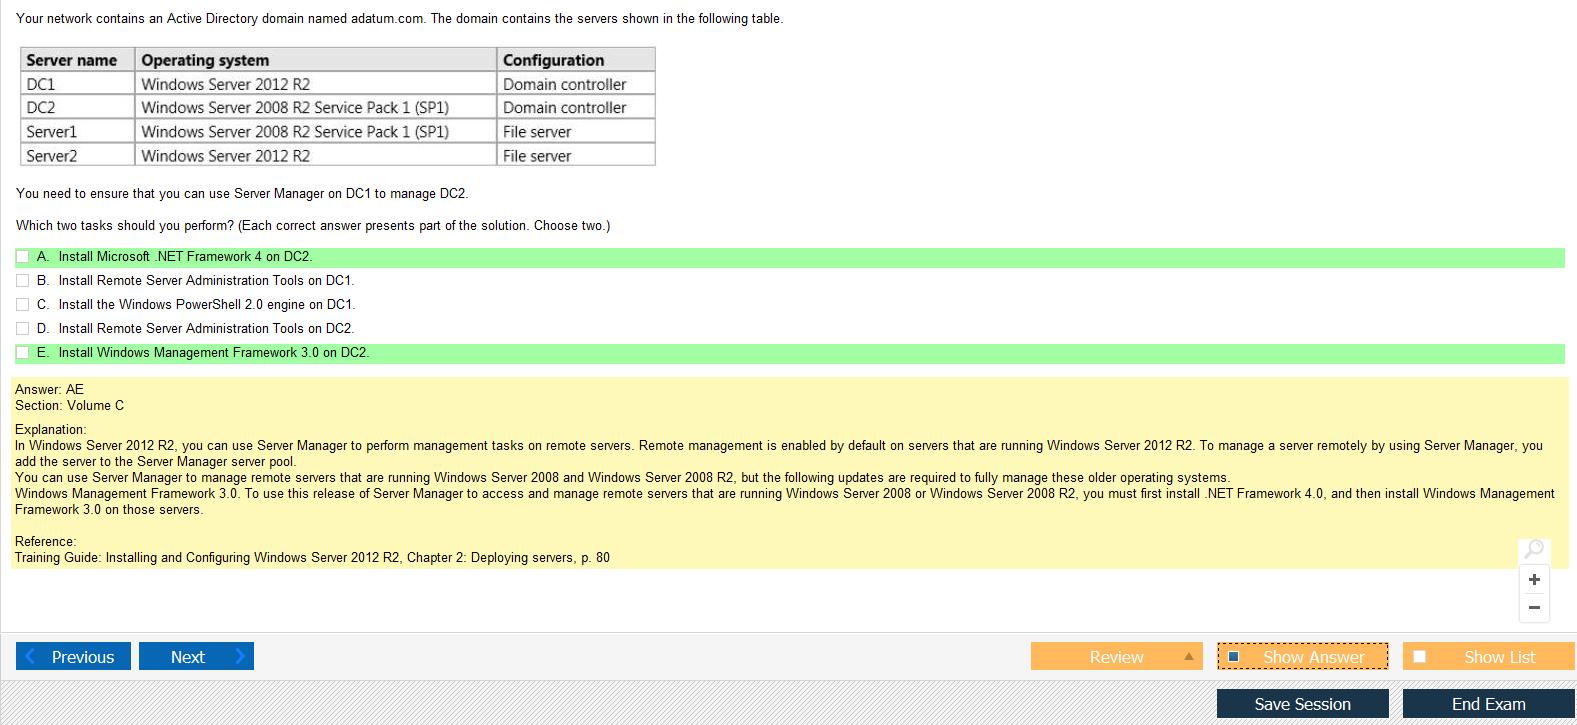 Mcsa exam 70 410 installing and configuring windows server 2012 exam 70 410 pic 3 xflitez Images